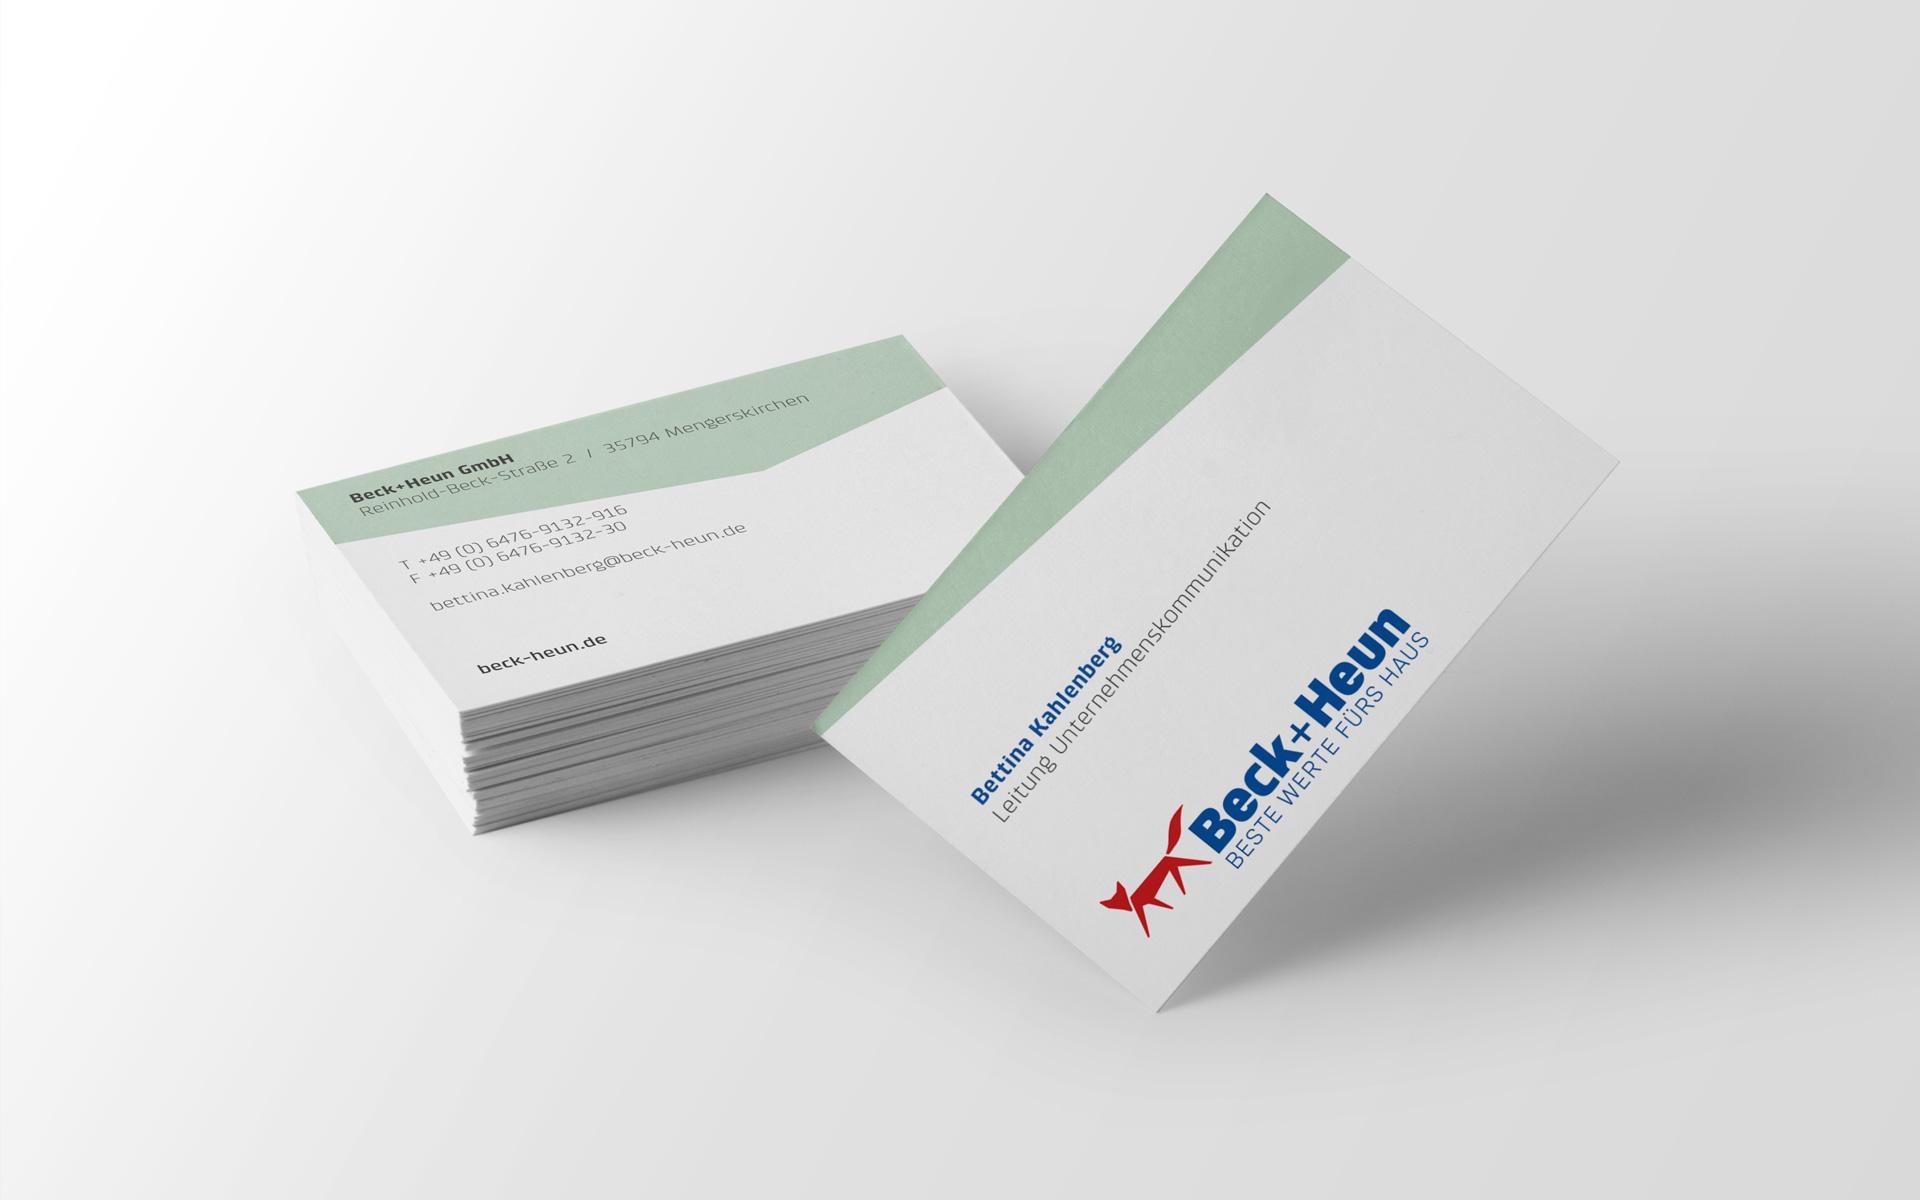 Beck+Heun Corporate Design, Markenkommunikation, Visitenkarten